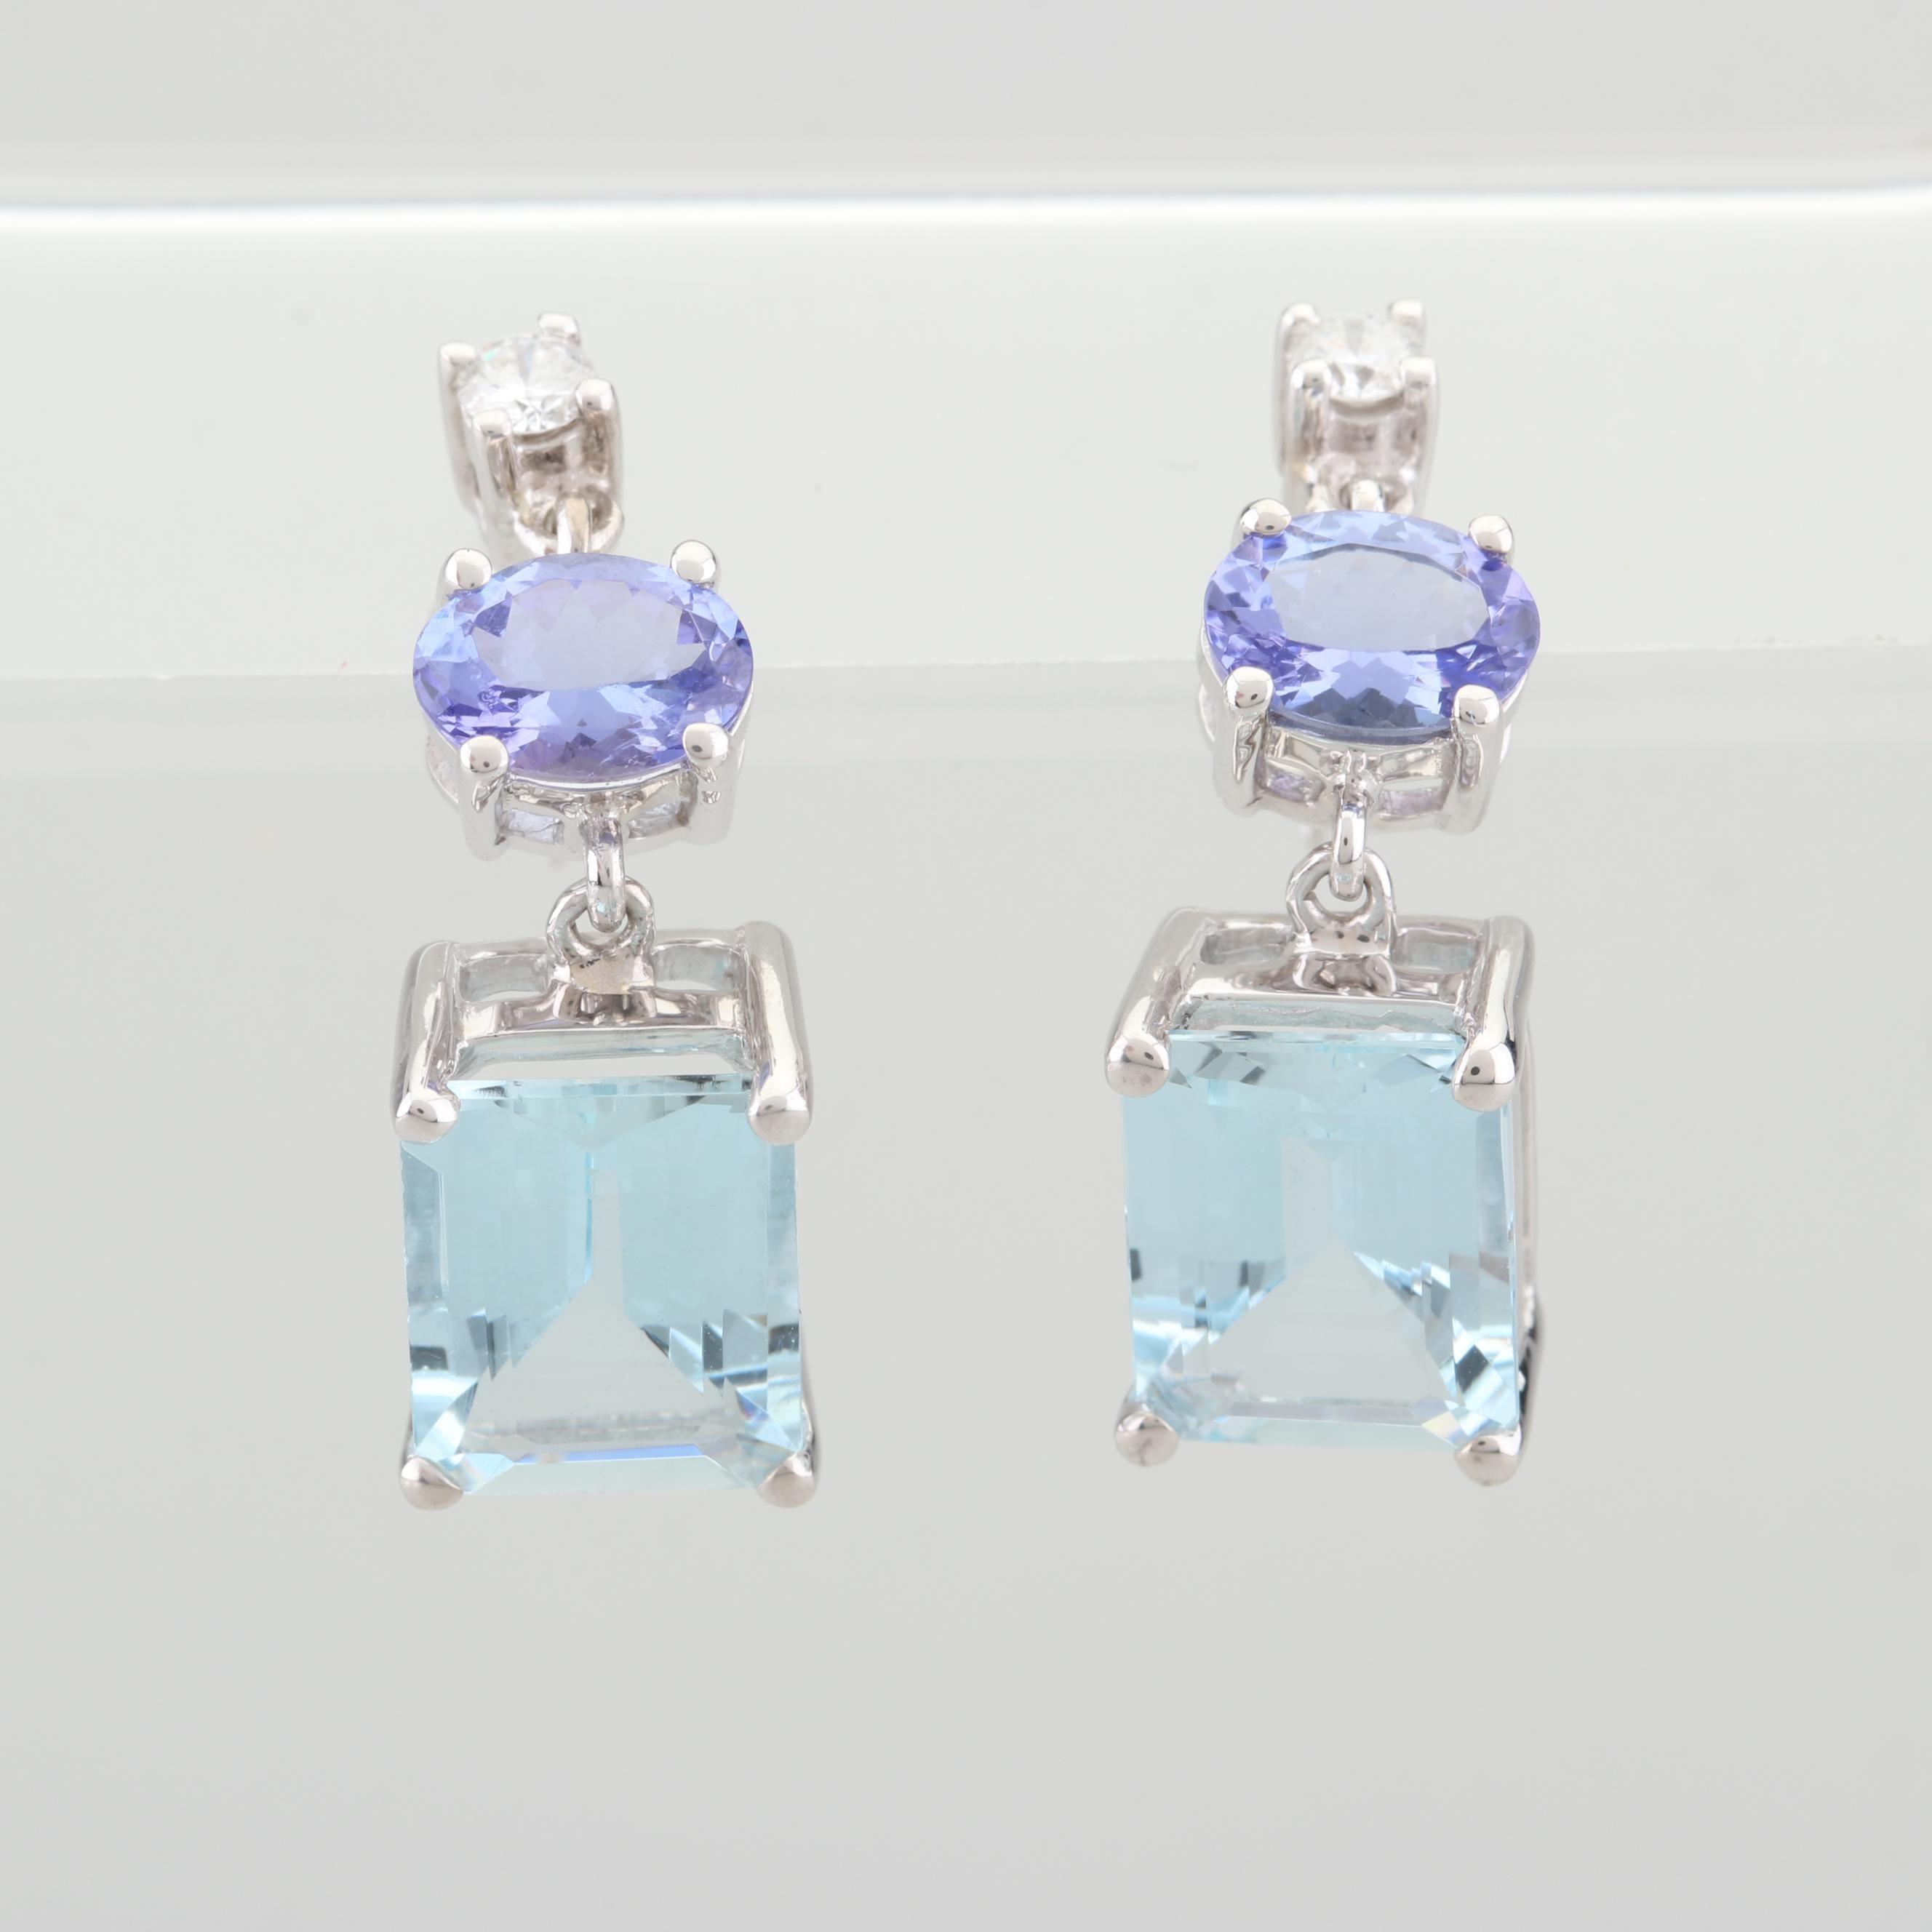 14K White Gold 7.50 CTW Aquamarine and 1.33 CTW Tanzanite and Diamond Earrings